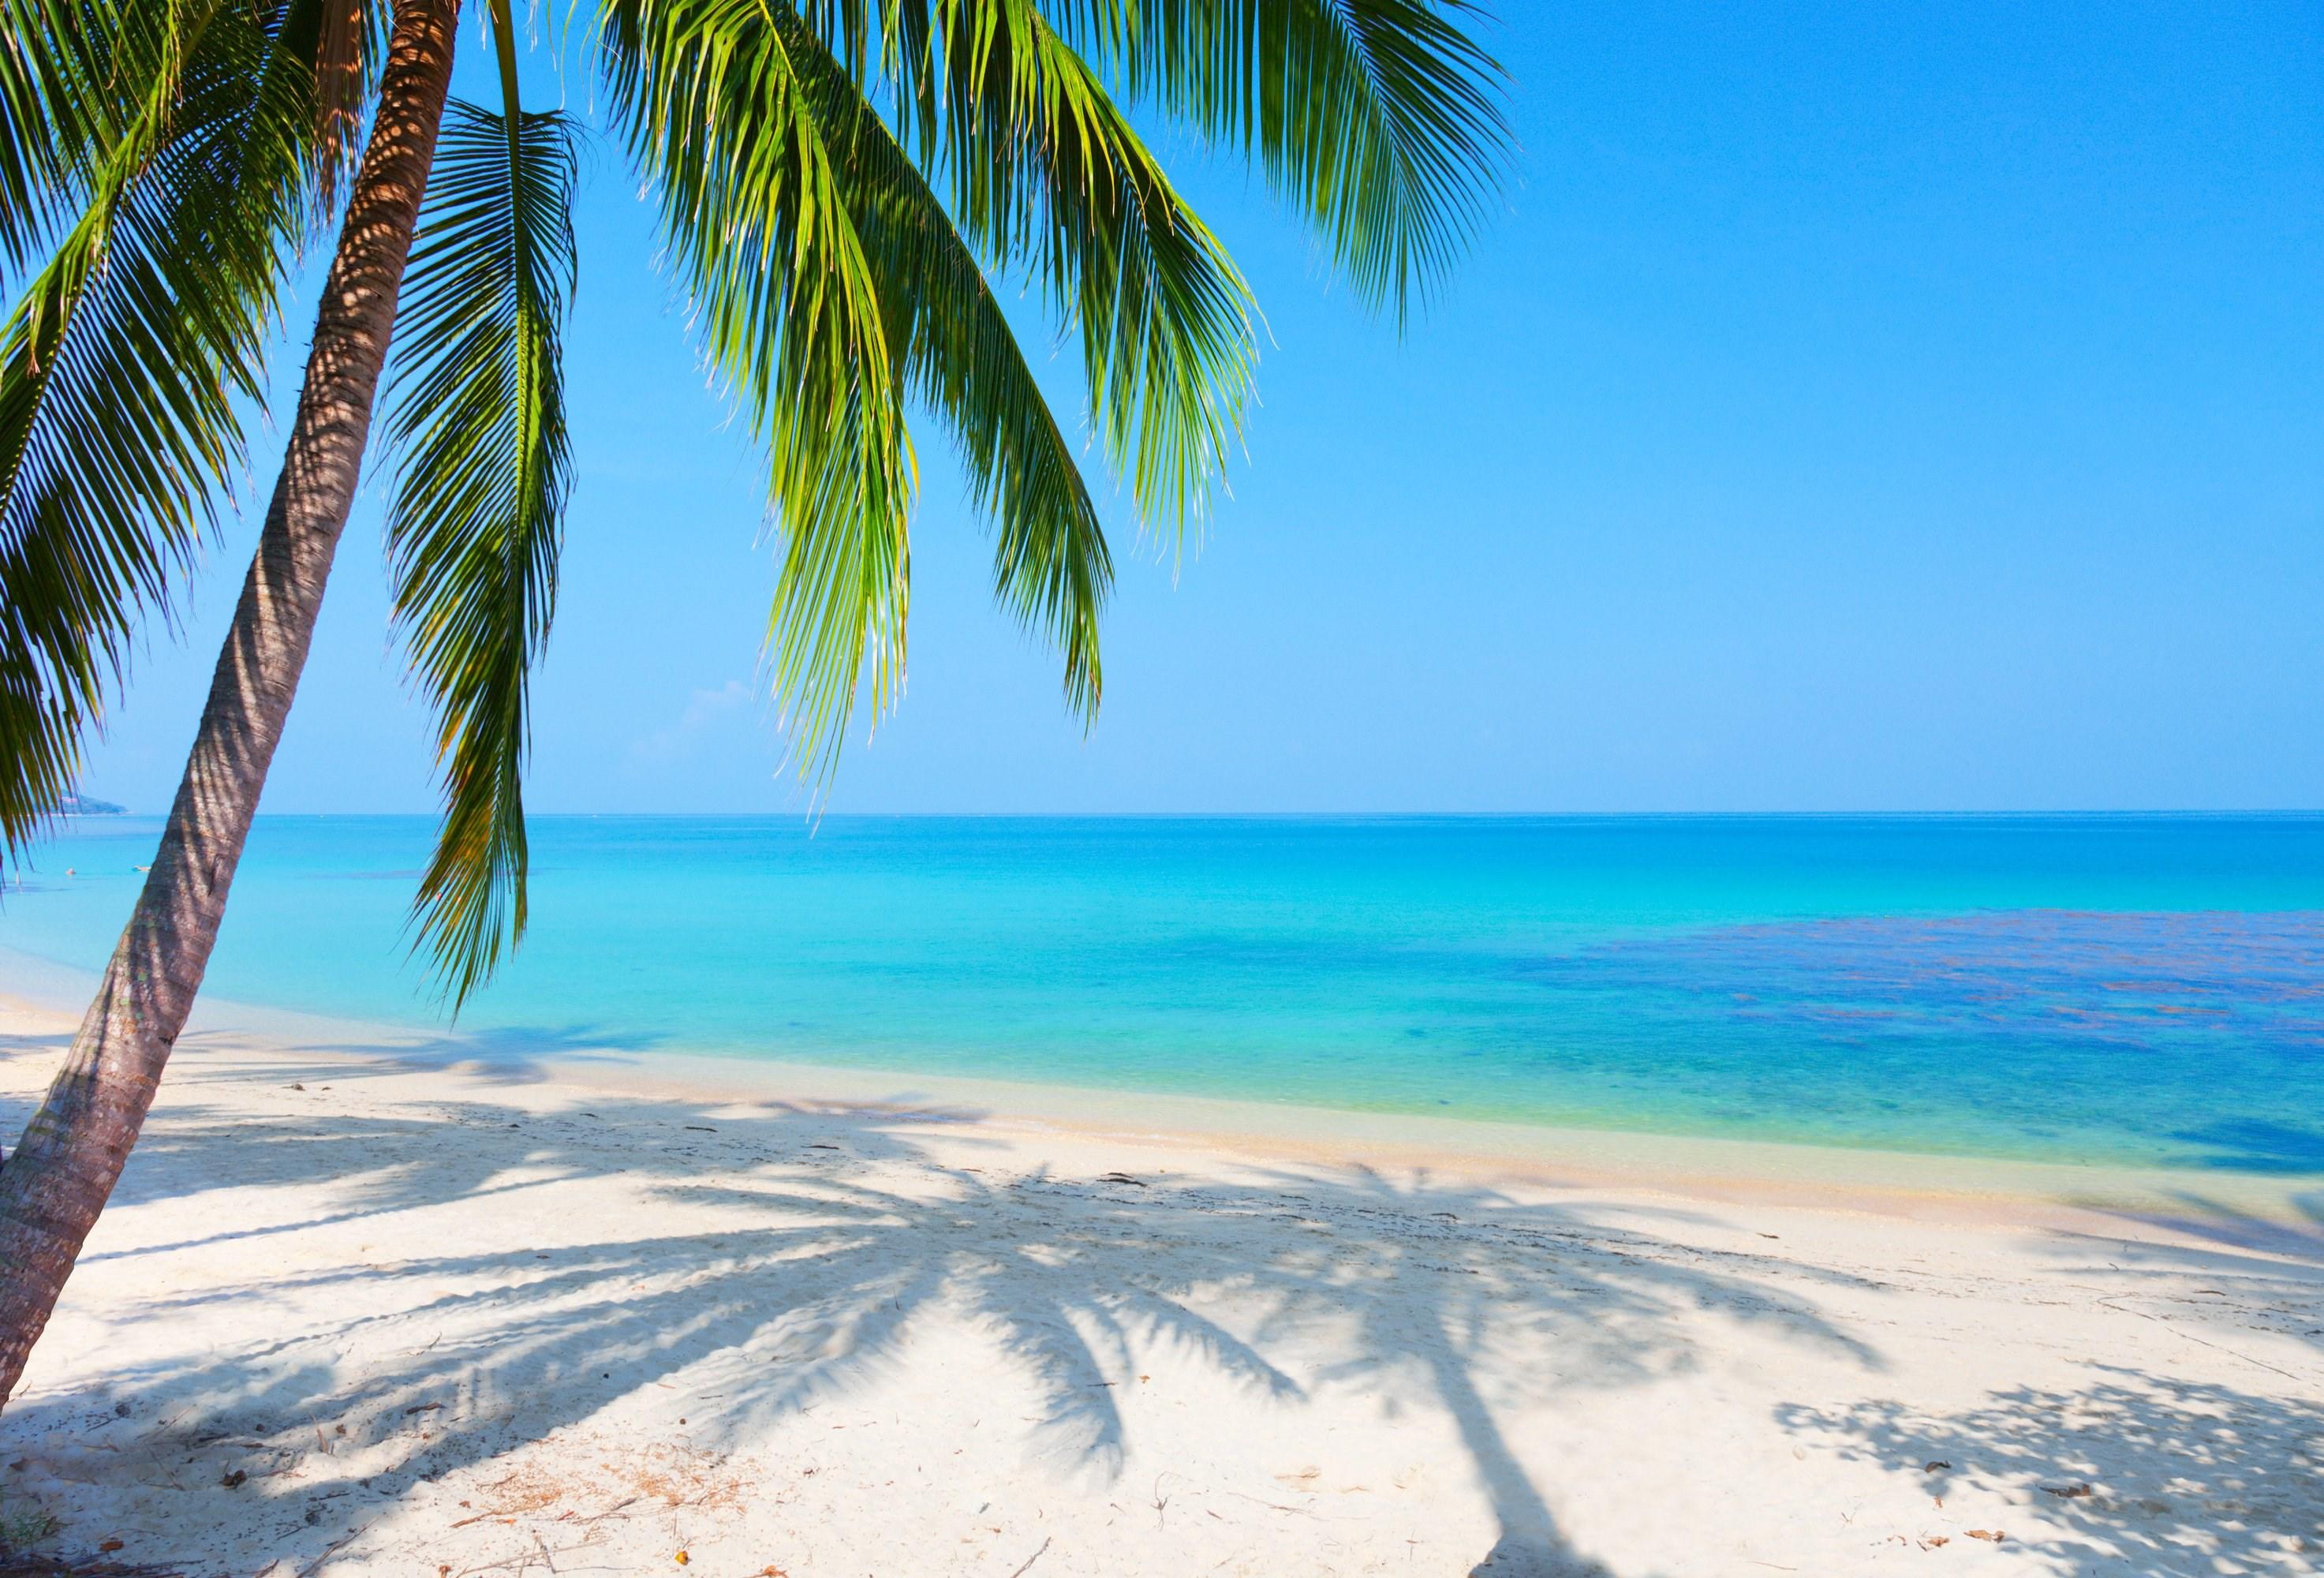 Beach Reflection Landscape Palm Tree Wallpaper 2946x2000